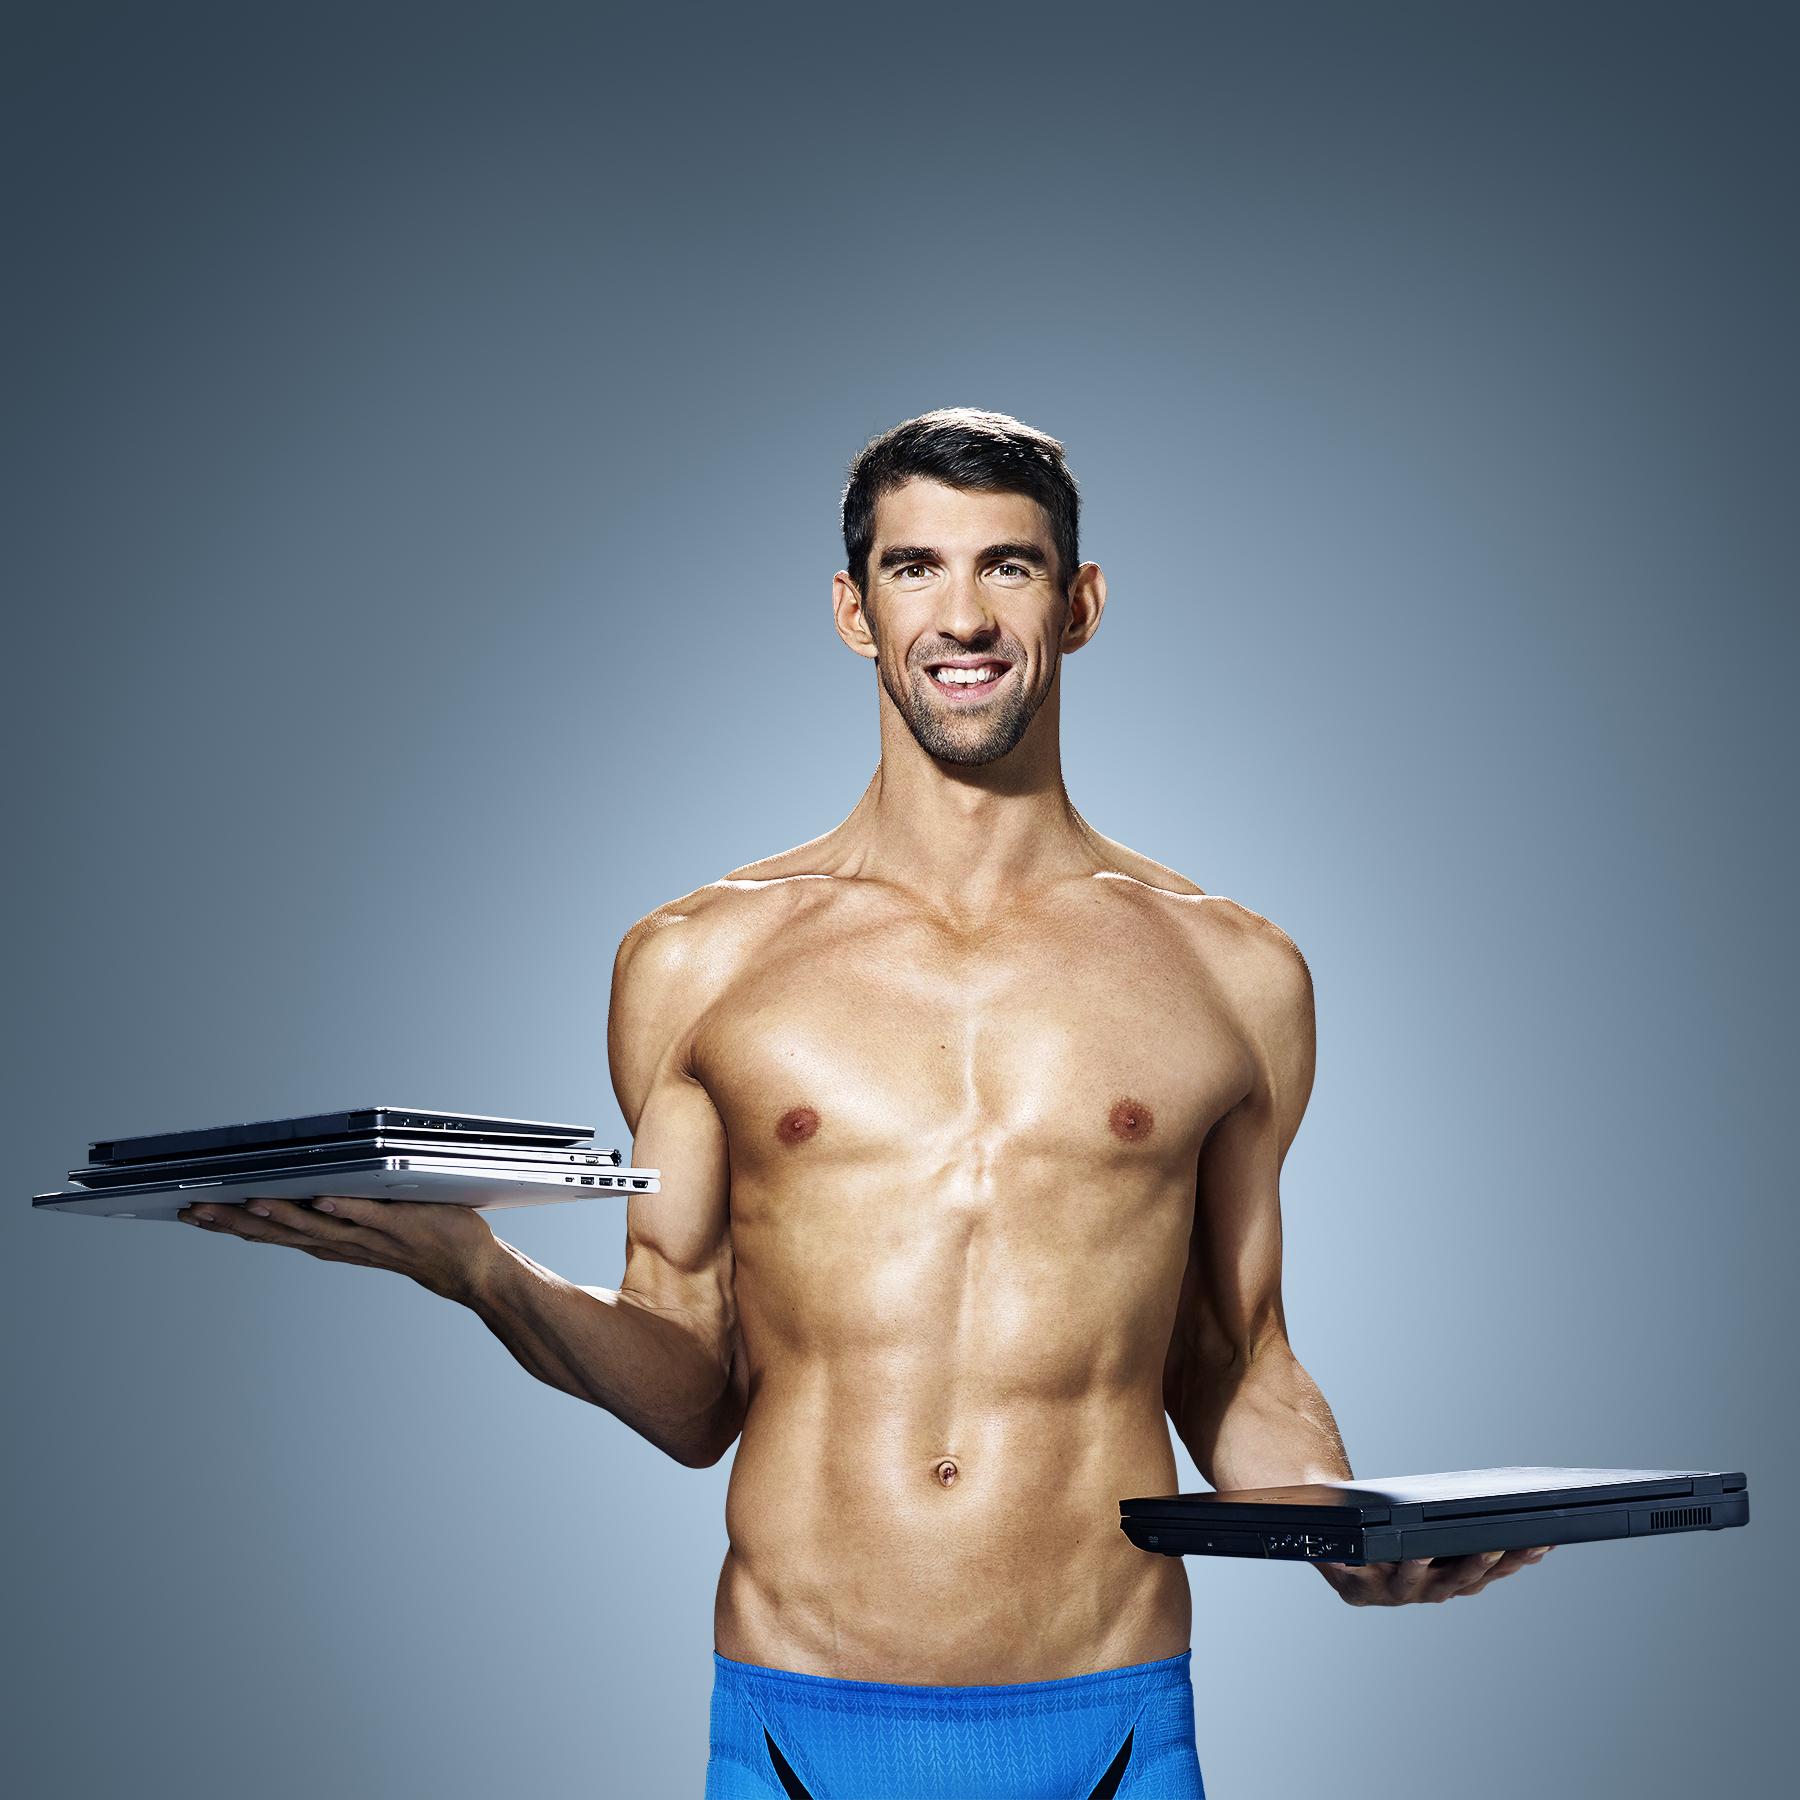 Michael Phelps_Old PCs_0068.jpg